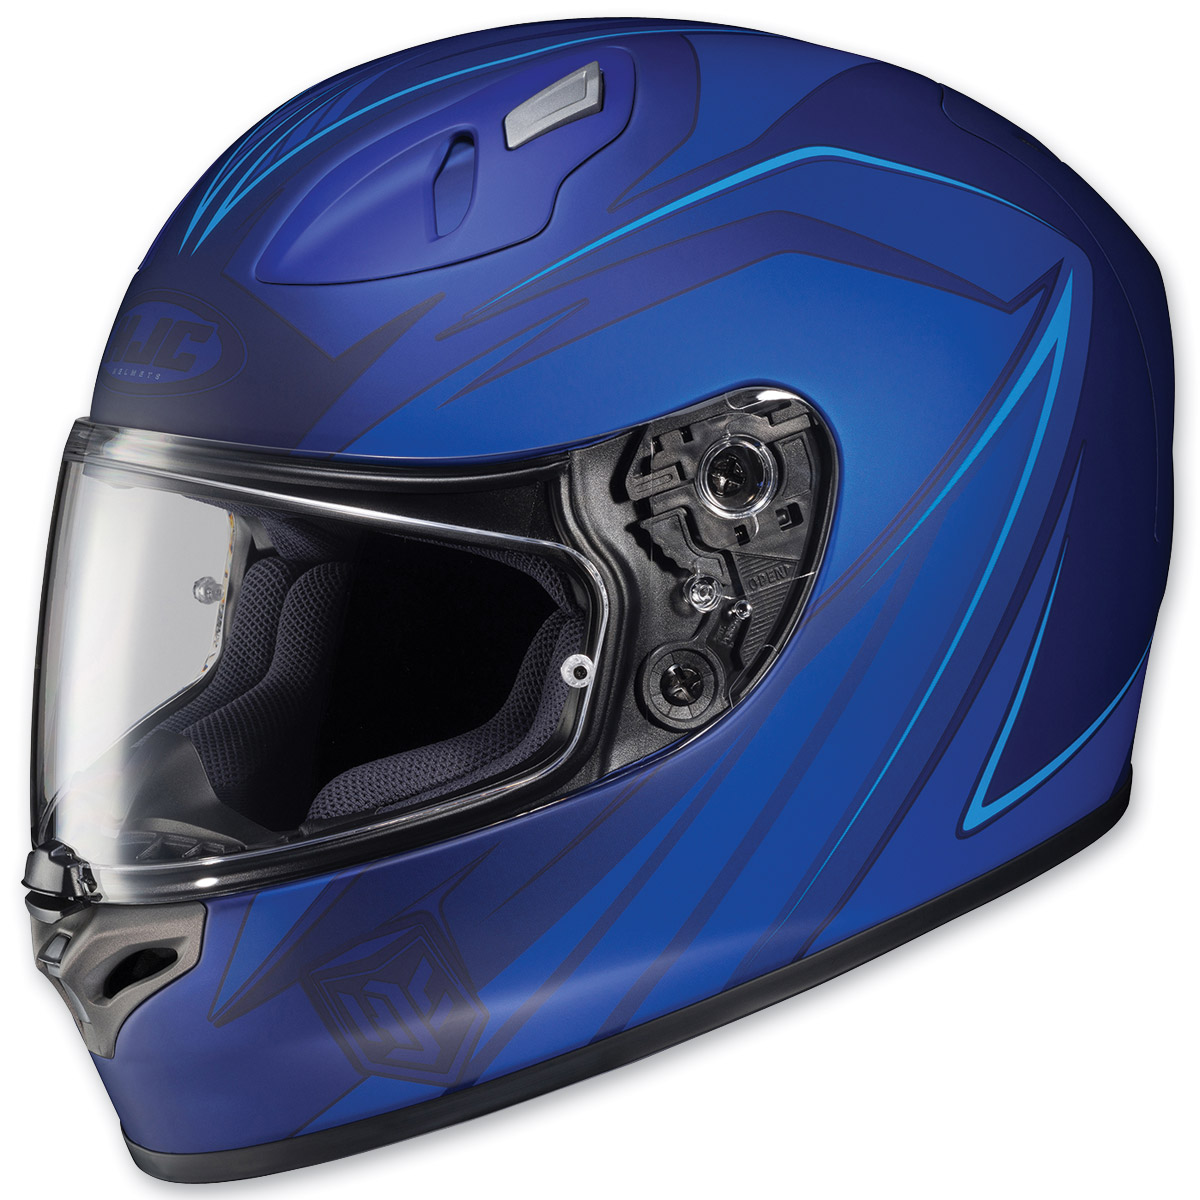 hjc fg 17 full face helmet ebay. Black Bedroom Furniture Sets. Home Design Ideas